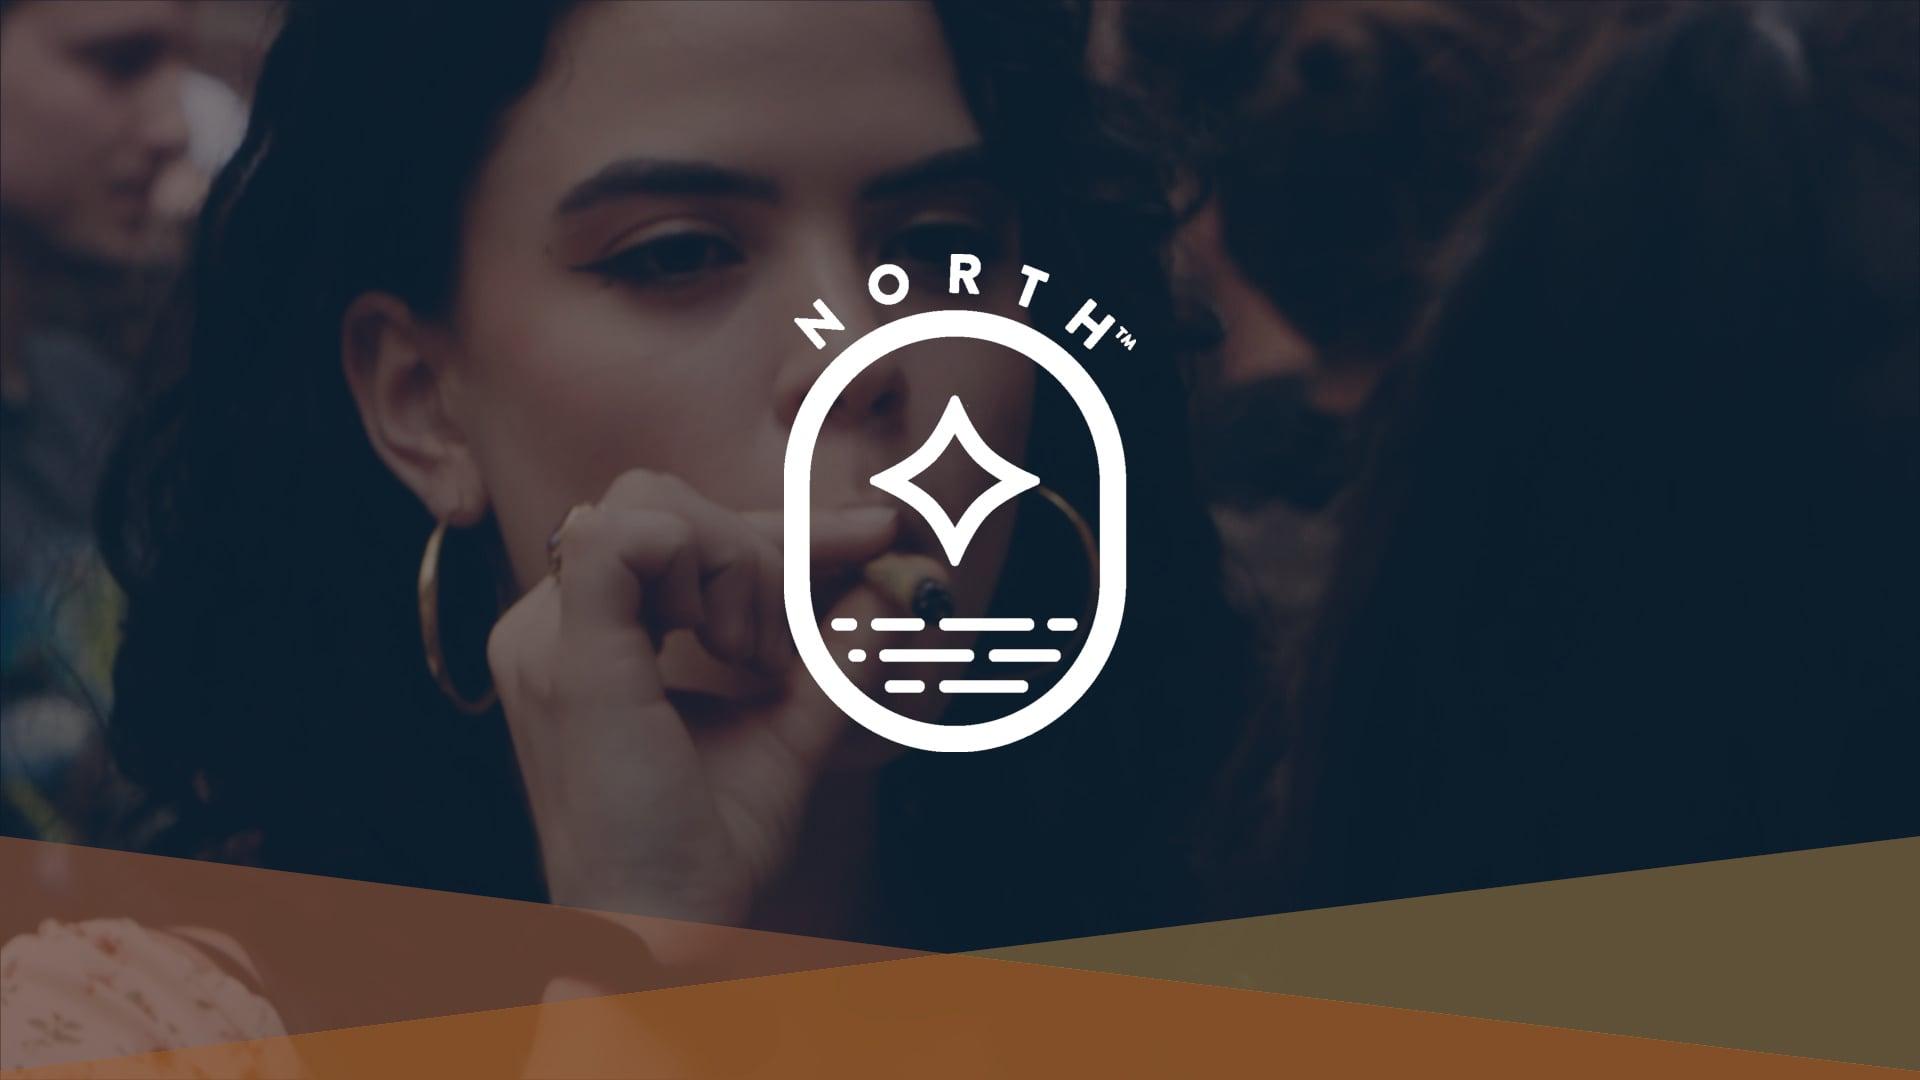 NORTH + SMPLFD present 'Feelin' Real Good'